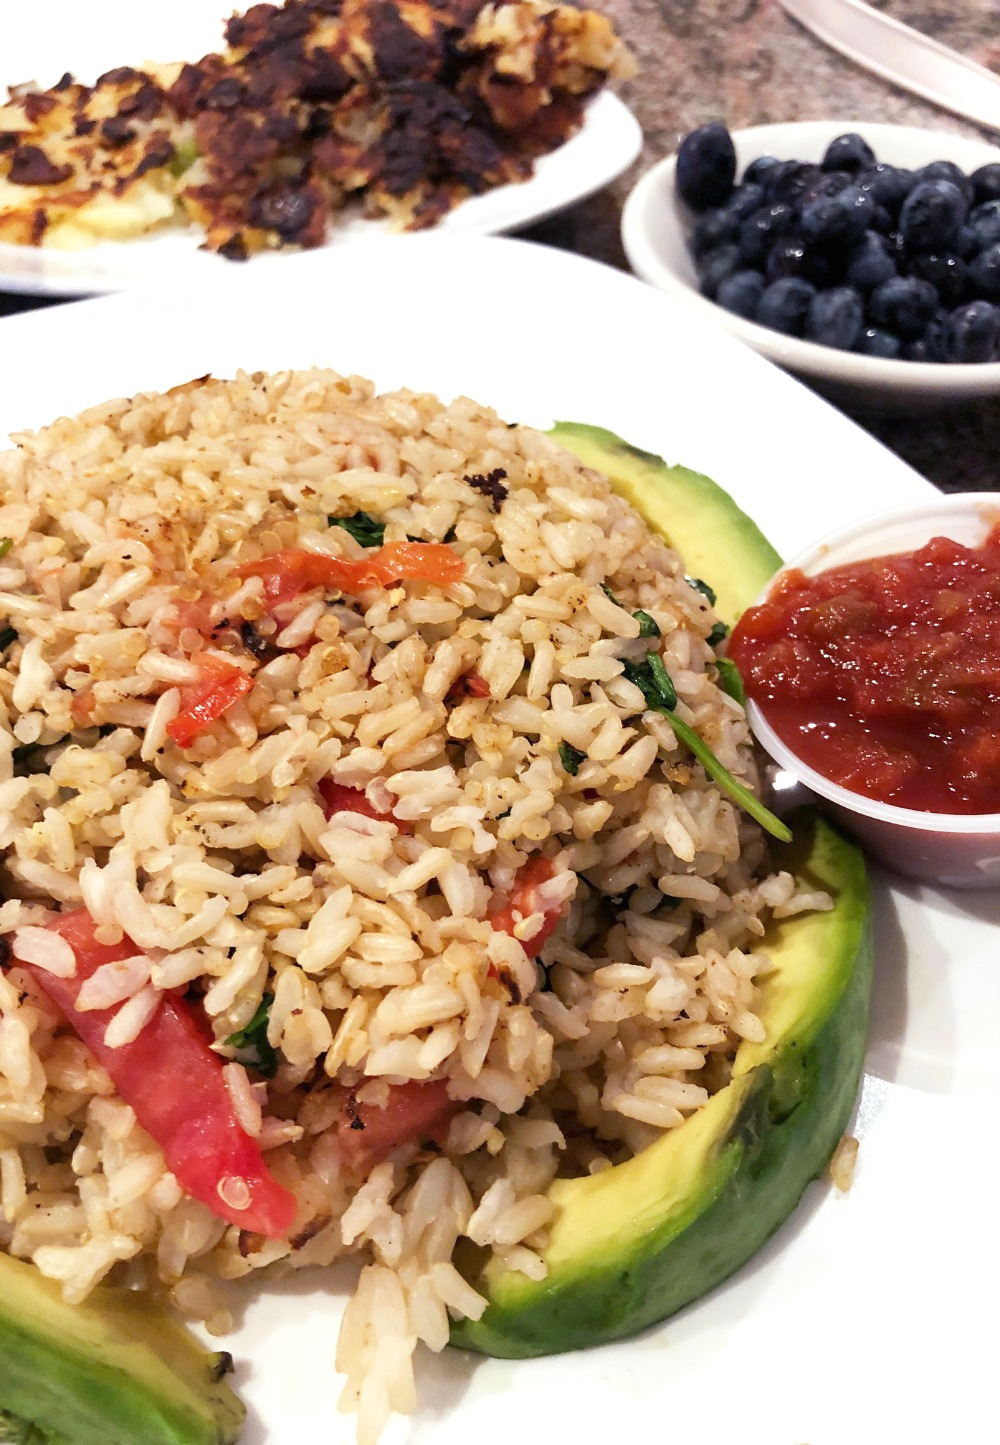 New Jersey Photo Diary I Breakfast at the Prestige Diner #Travel #Travelblogger #veganeats